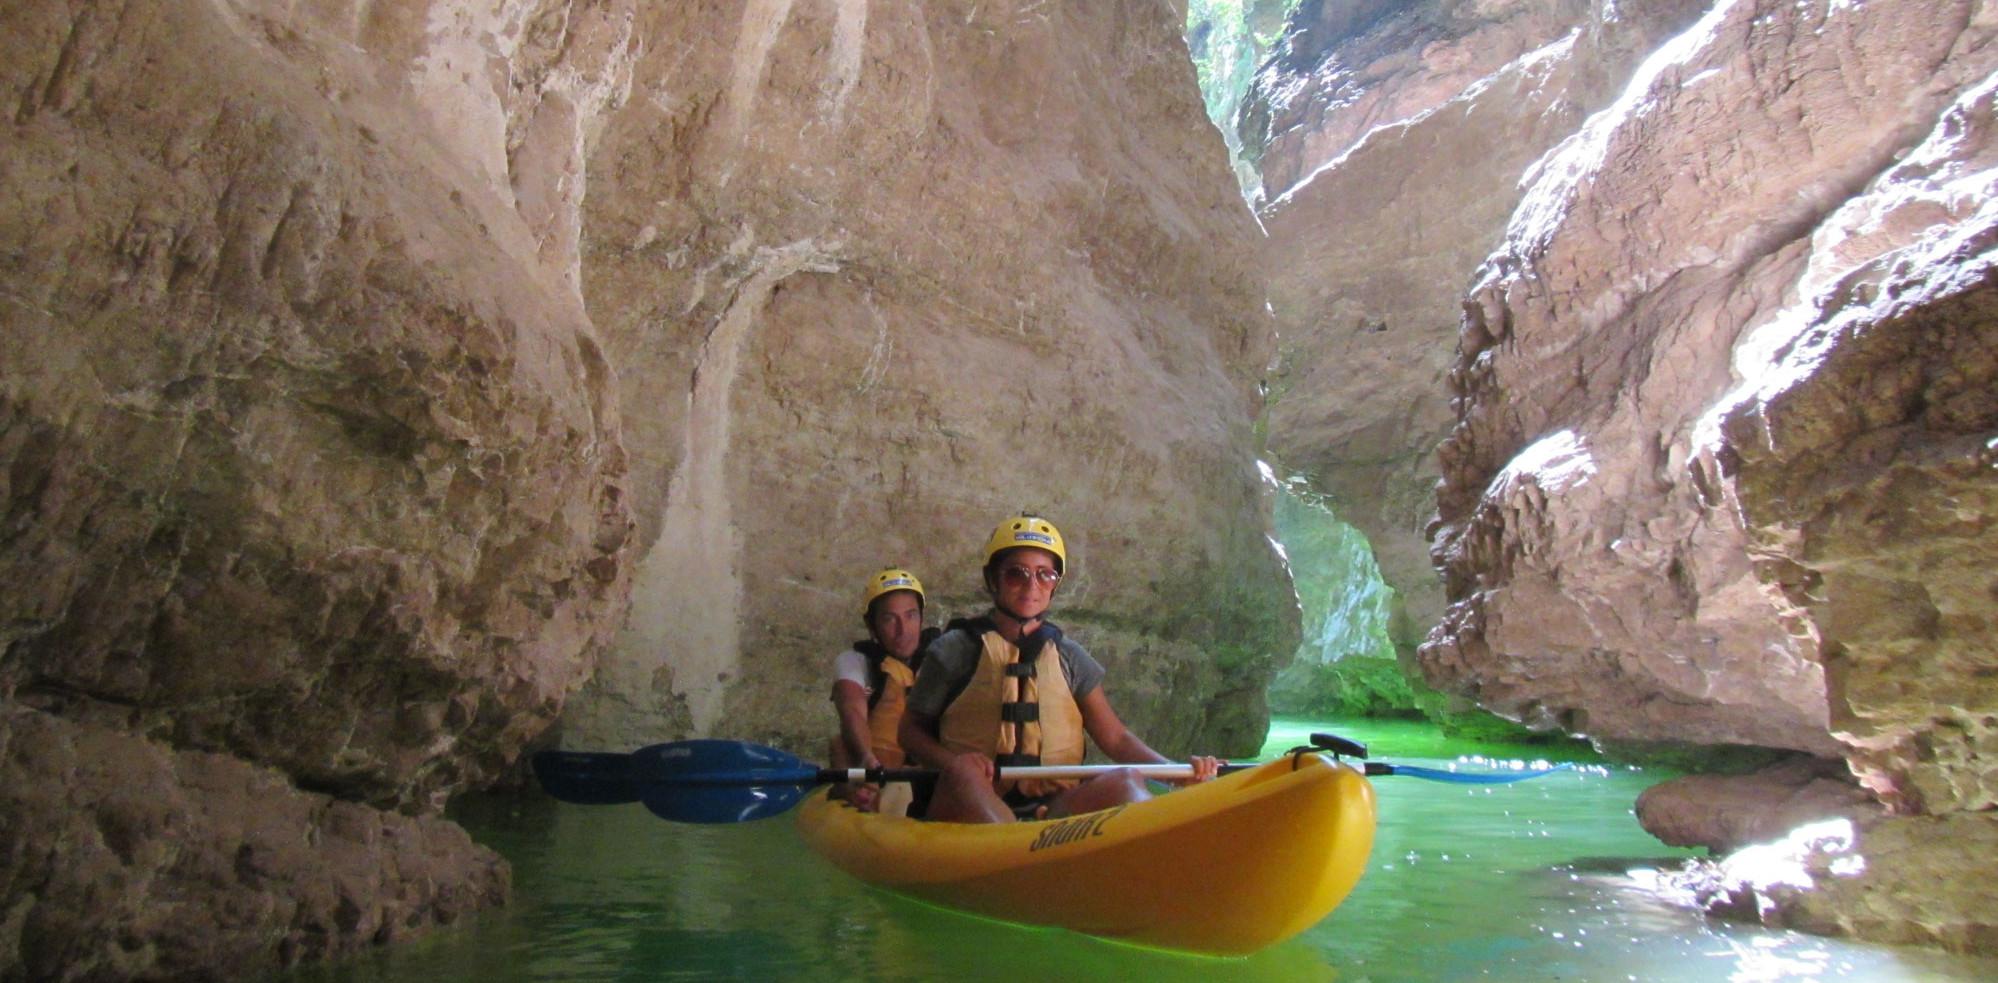 Canoe Adventure Rio Novella Gorges